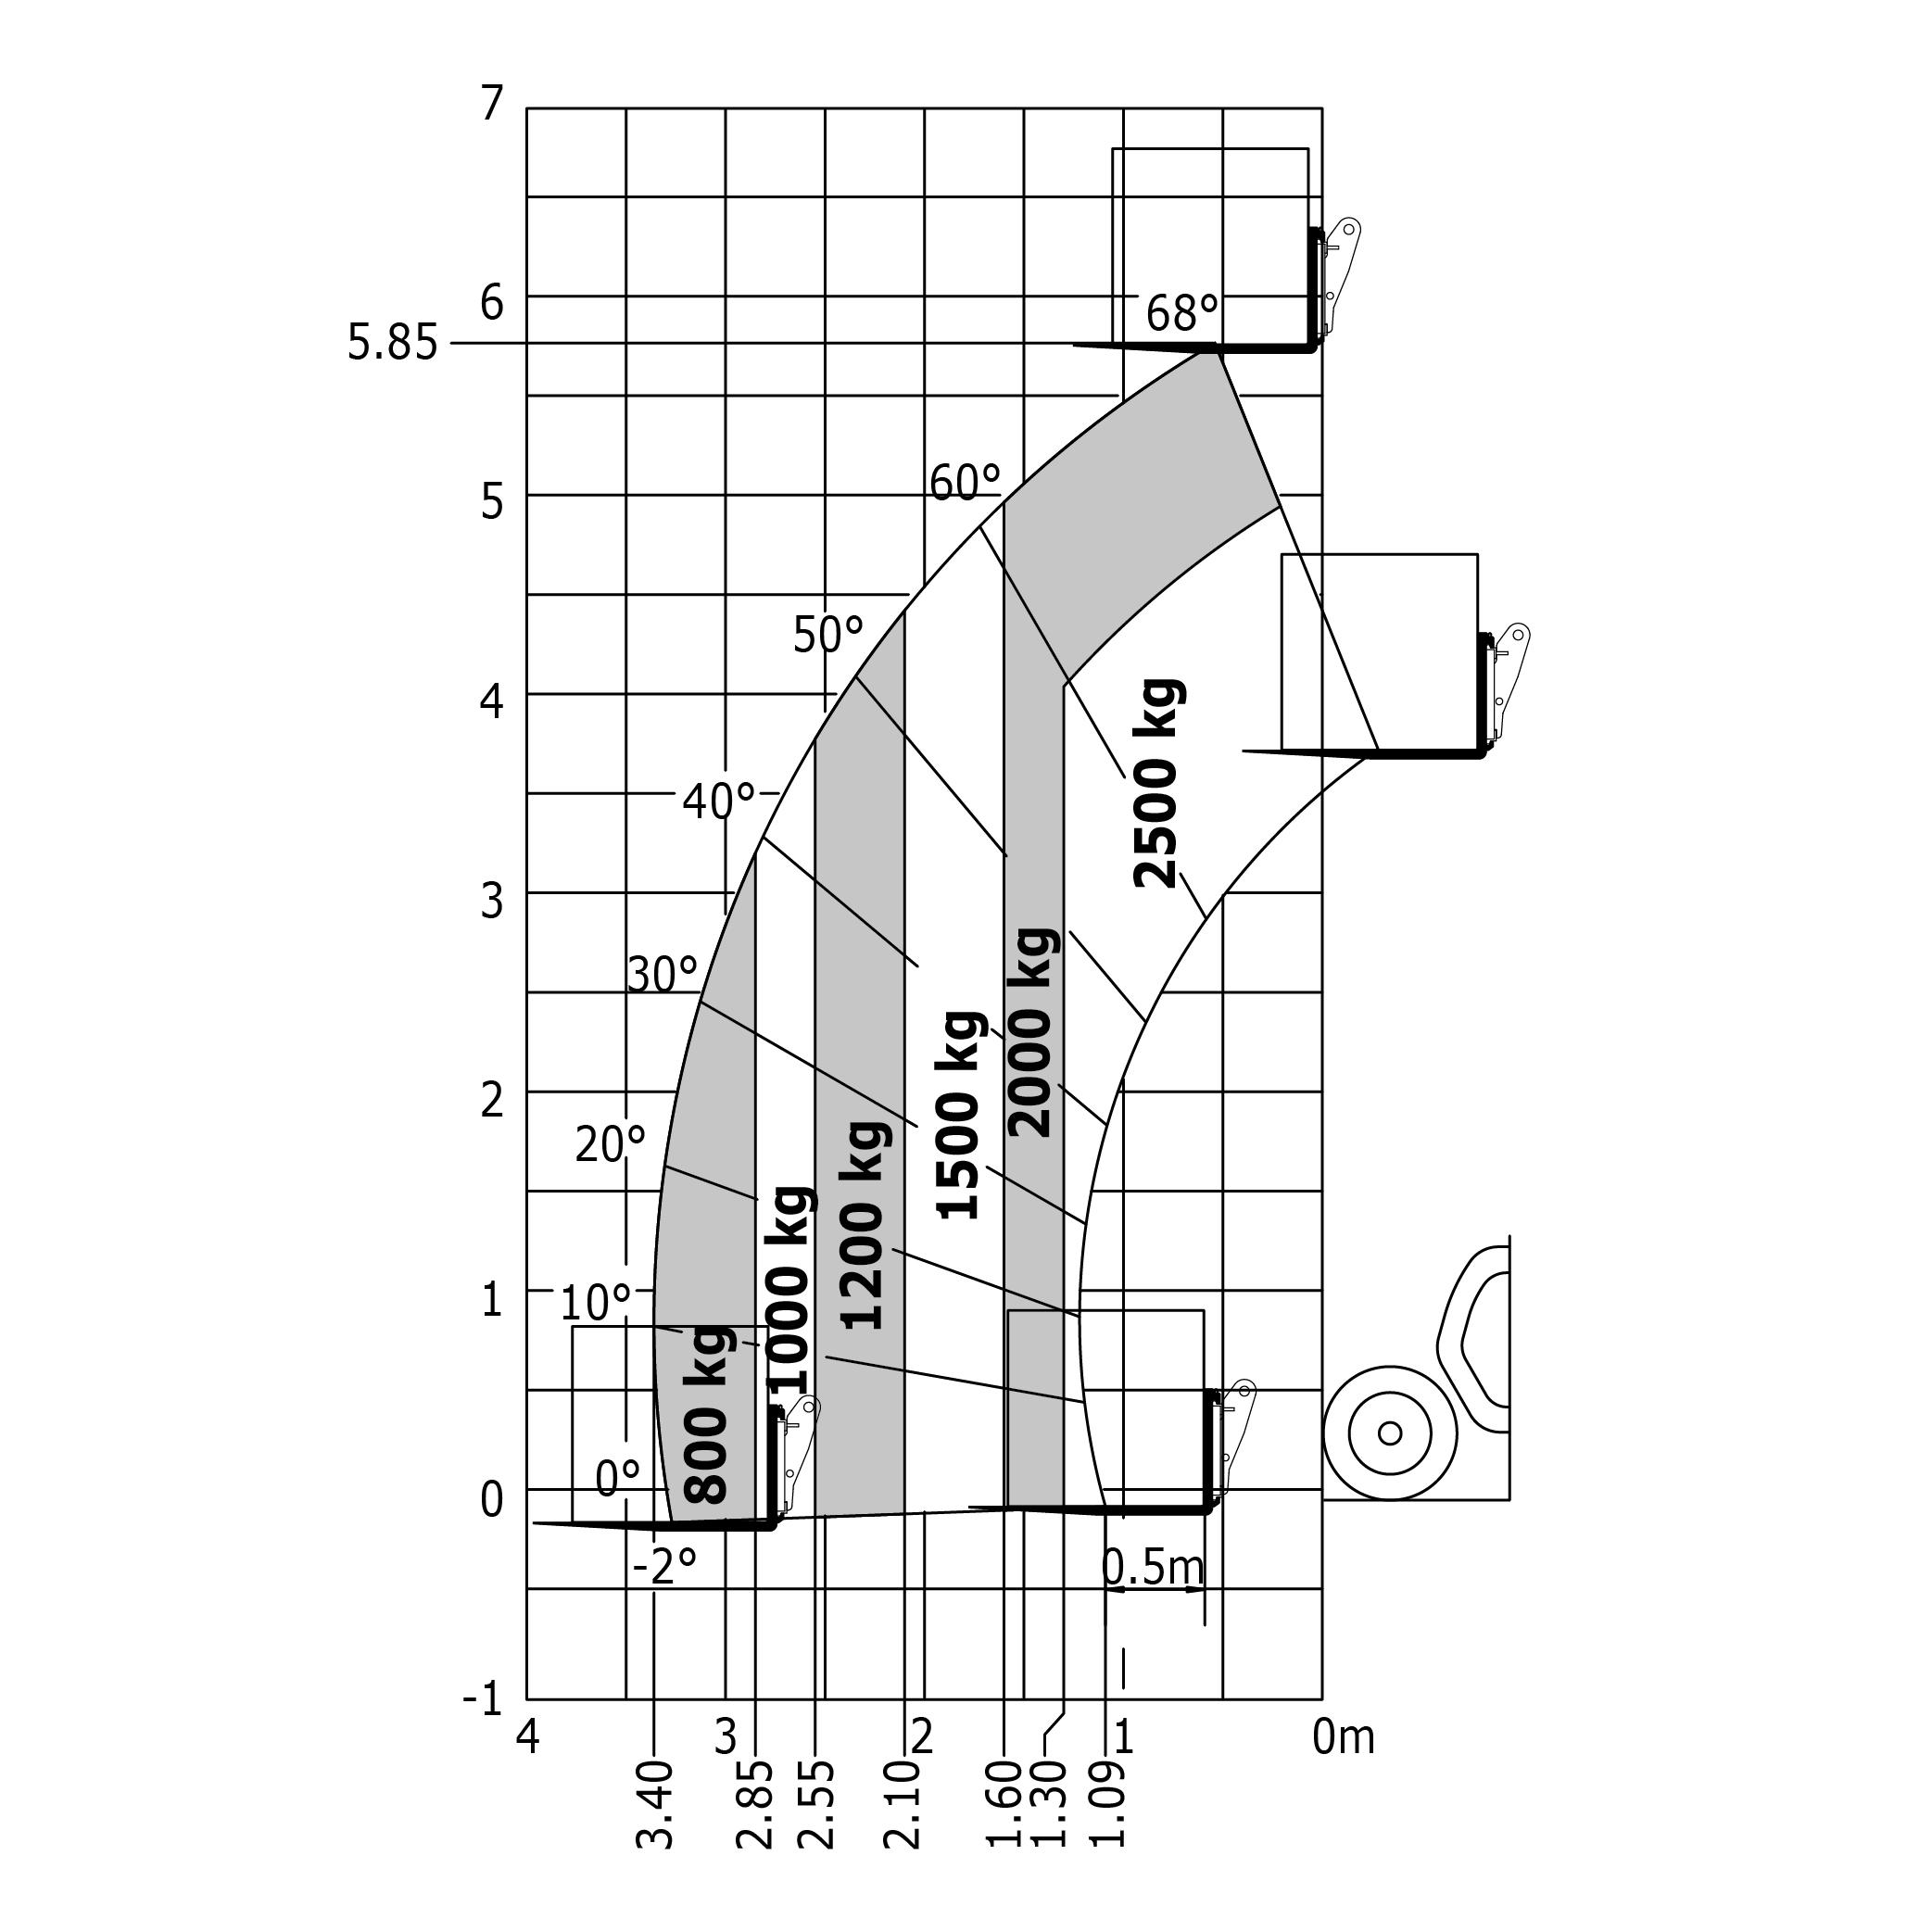 jcb js130 wiring diagram liftmaster garage door opener 520 and fuse box